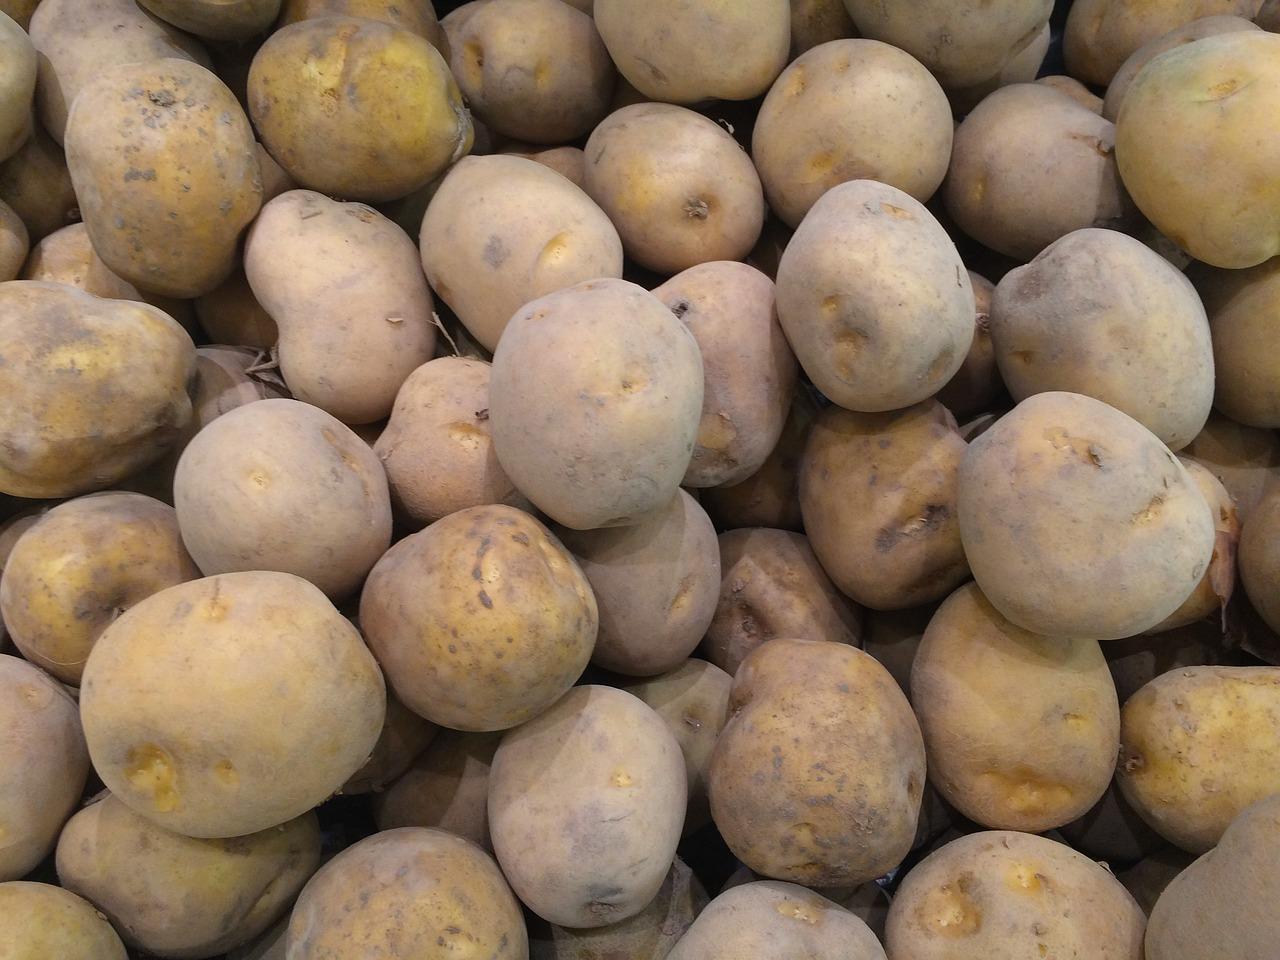 Potato,pile up,fruit,seiyu ltd,living - free photo from